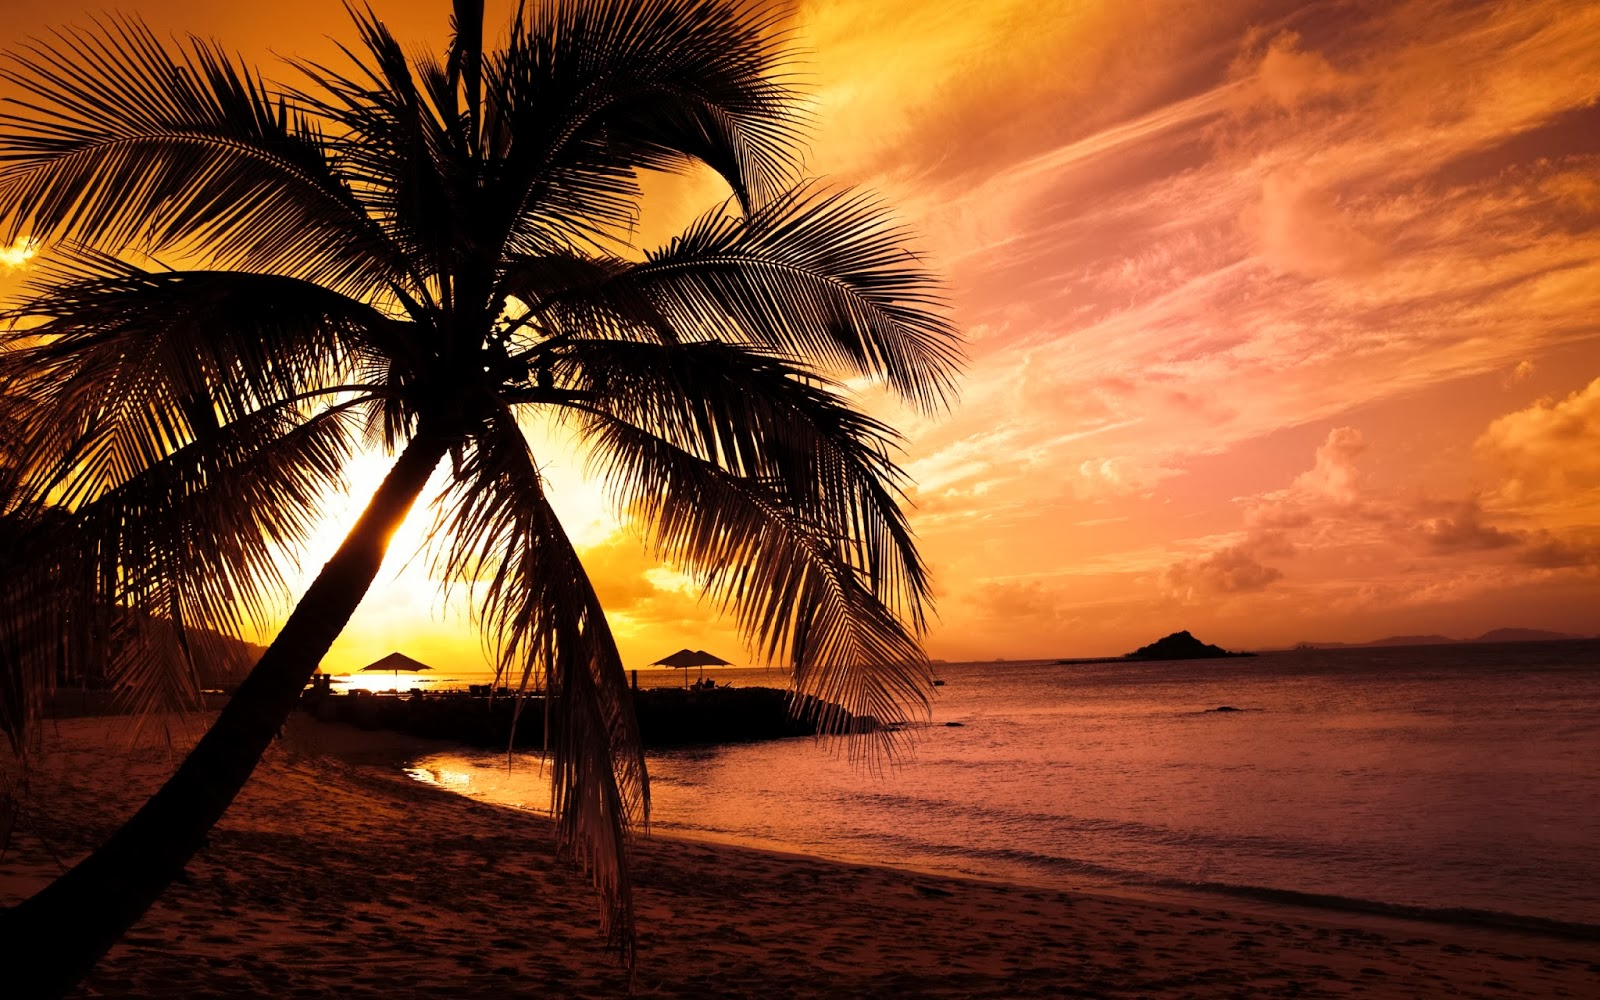 "<img src=""http://1.bp.blogspot.com/-zVKghUpwPyQ/Ut7W1ZwPX9I/AAAAAAAAJtA/qGHWF14RXNo/s1600/sunset-at-the-bay.jpg"" alt=""sunset at the bay"" />"